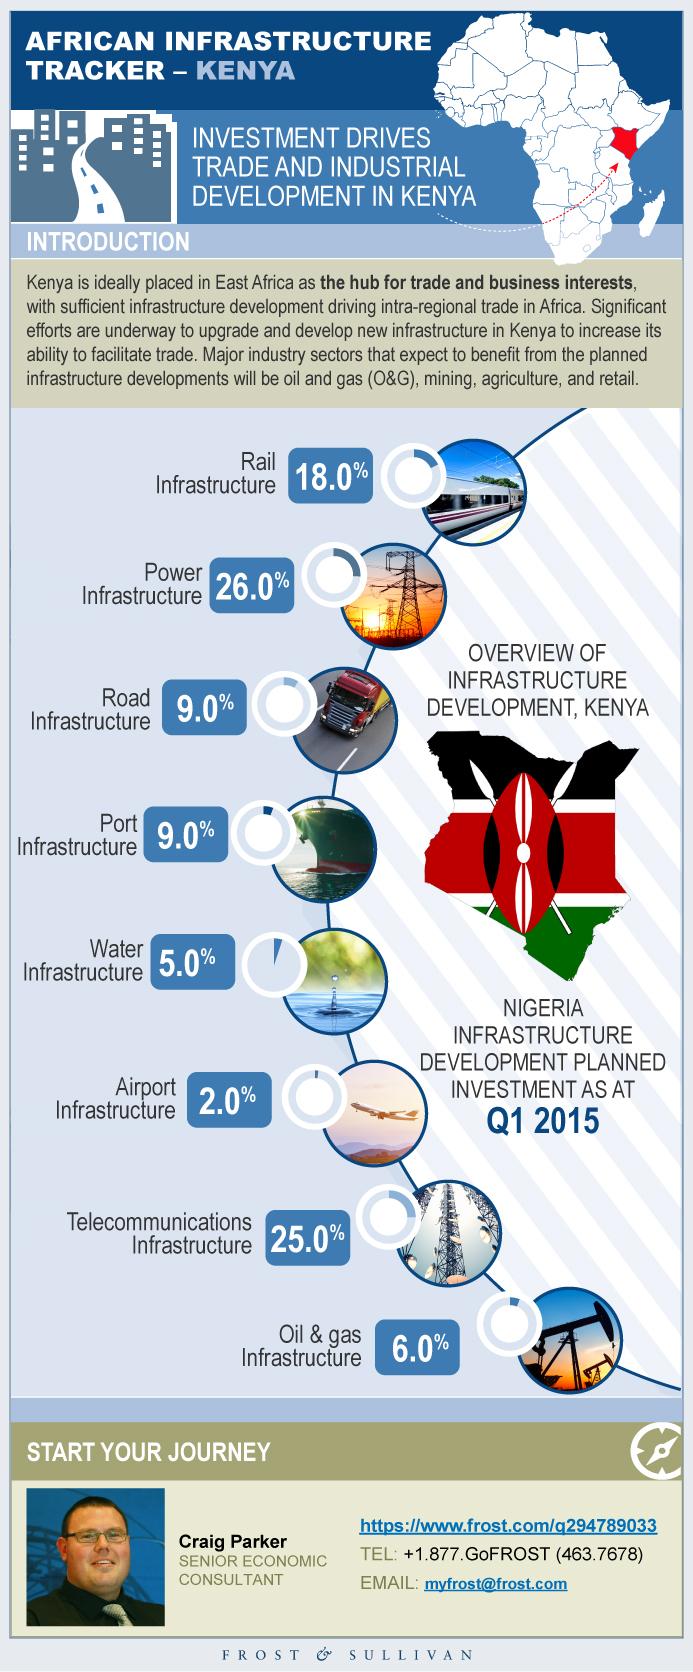 African Infrastructure Tracker: Kenya